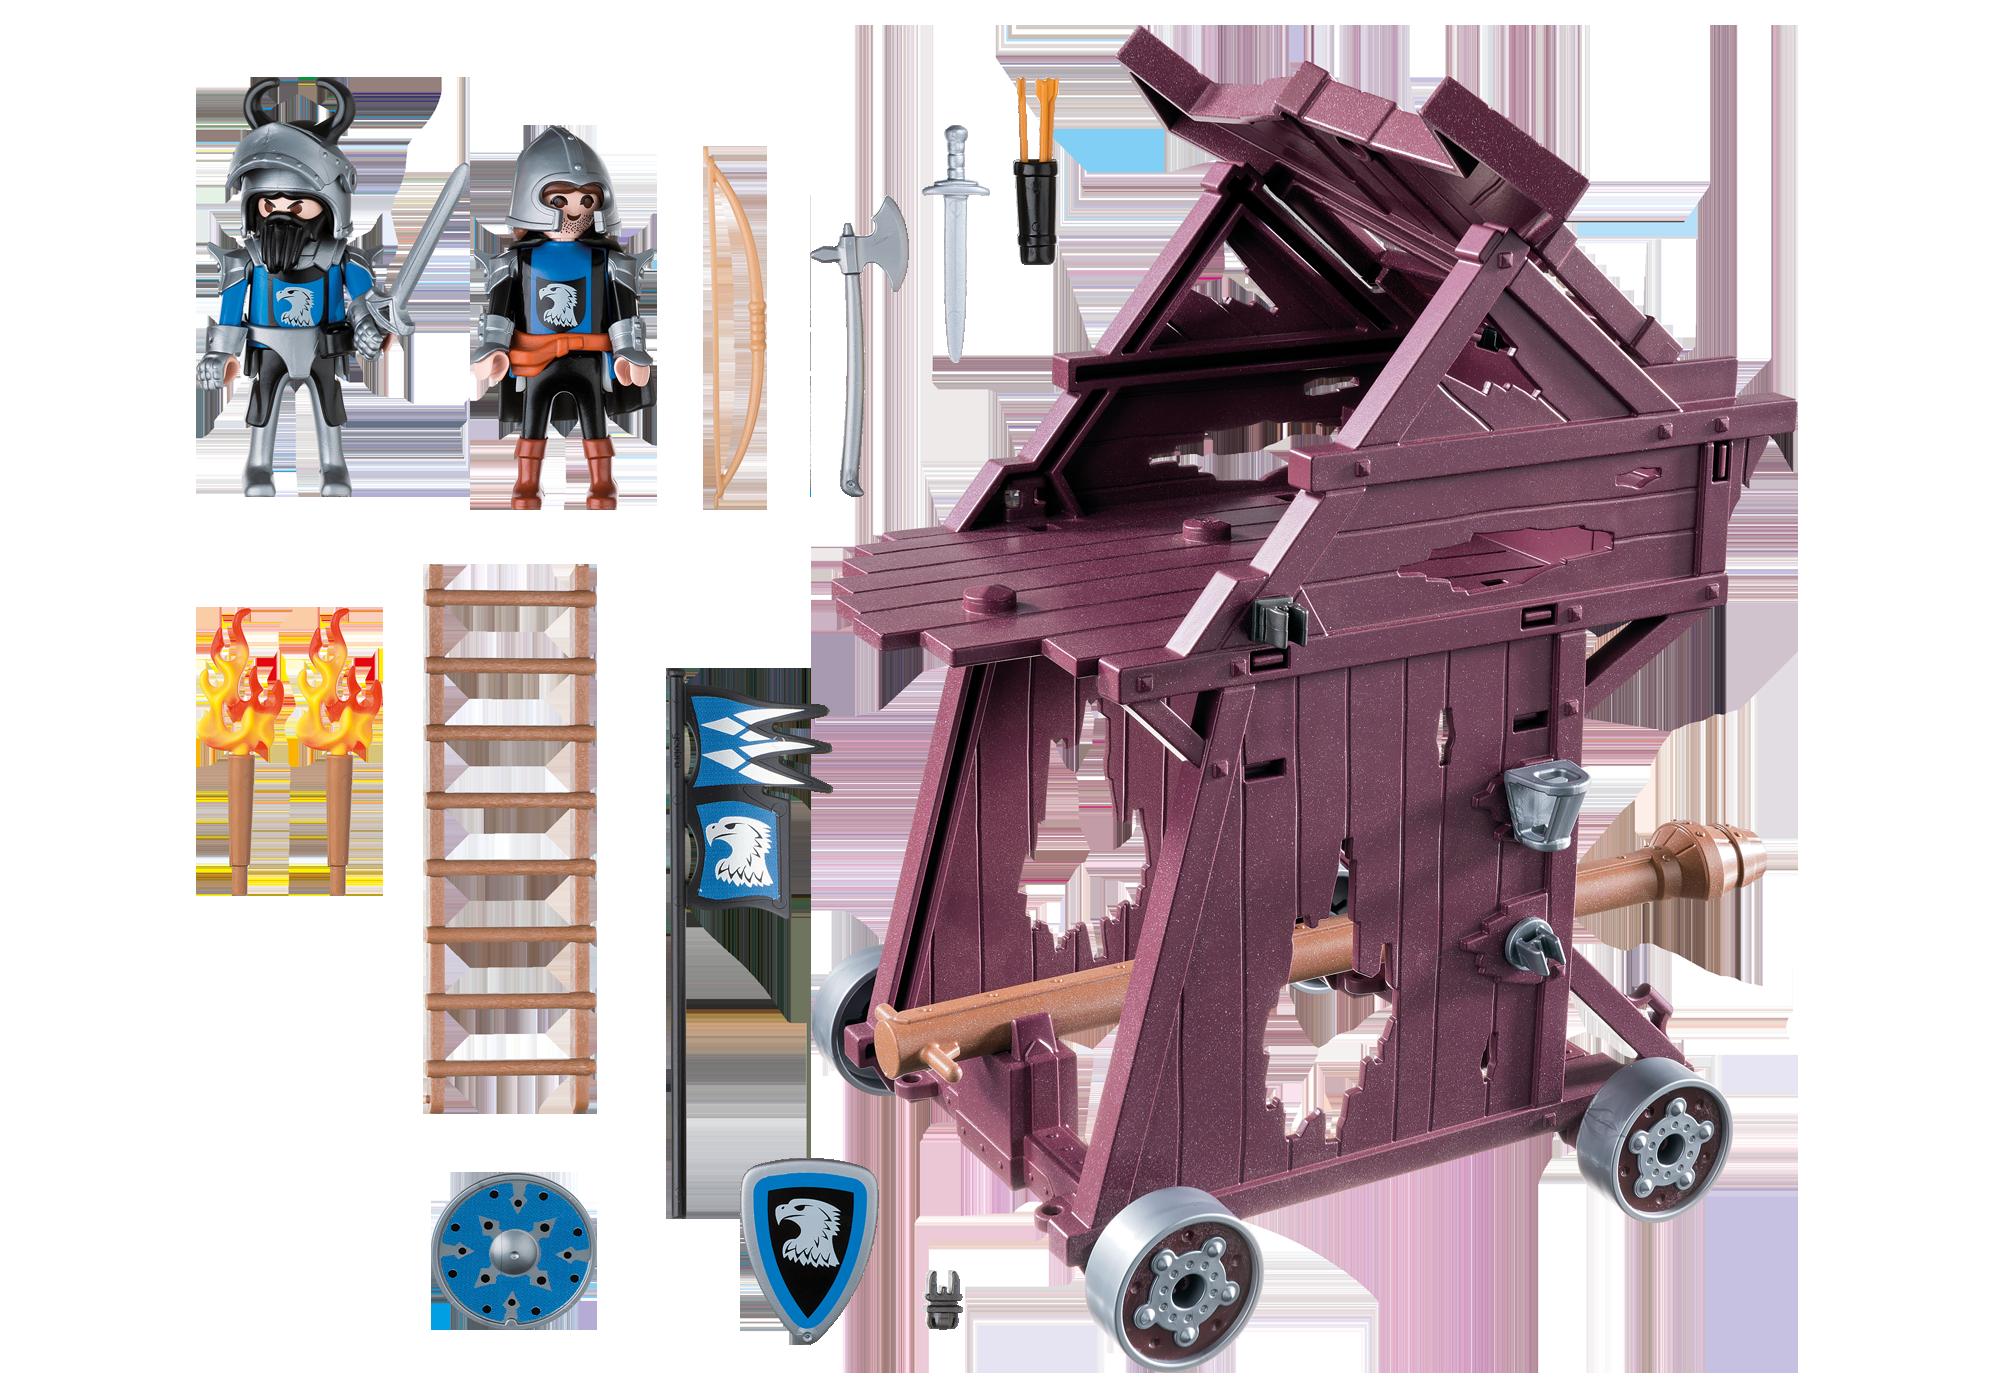 http://media.playmobil.com/i/playmobil/6628_product_box_back/Соперничество Рыцарей: Рыцари Орла атакуют Башню